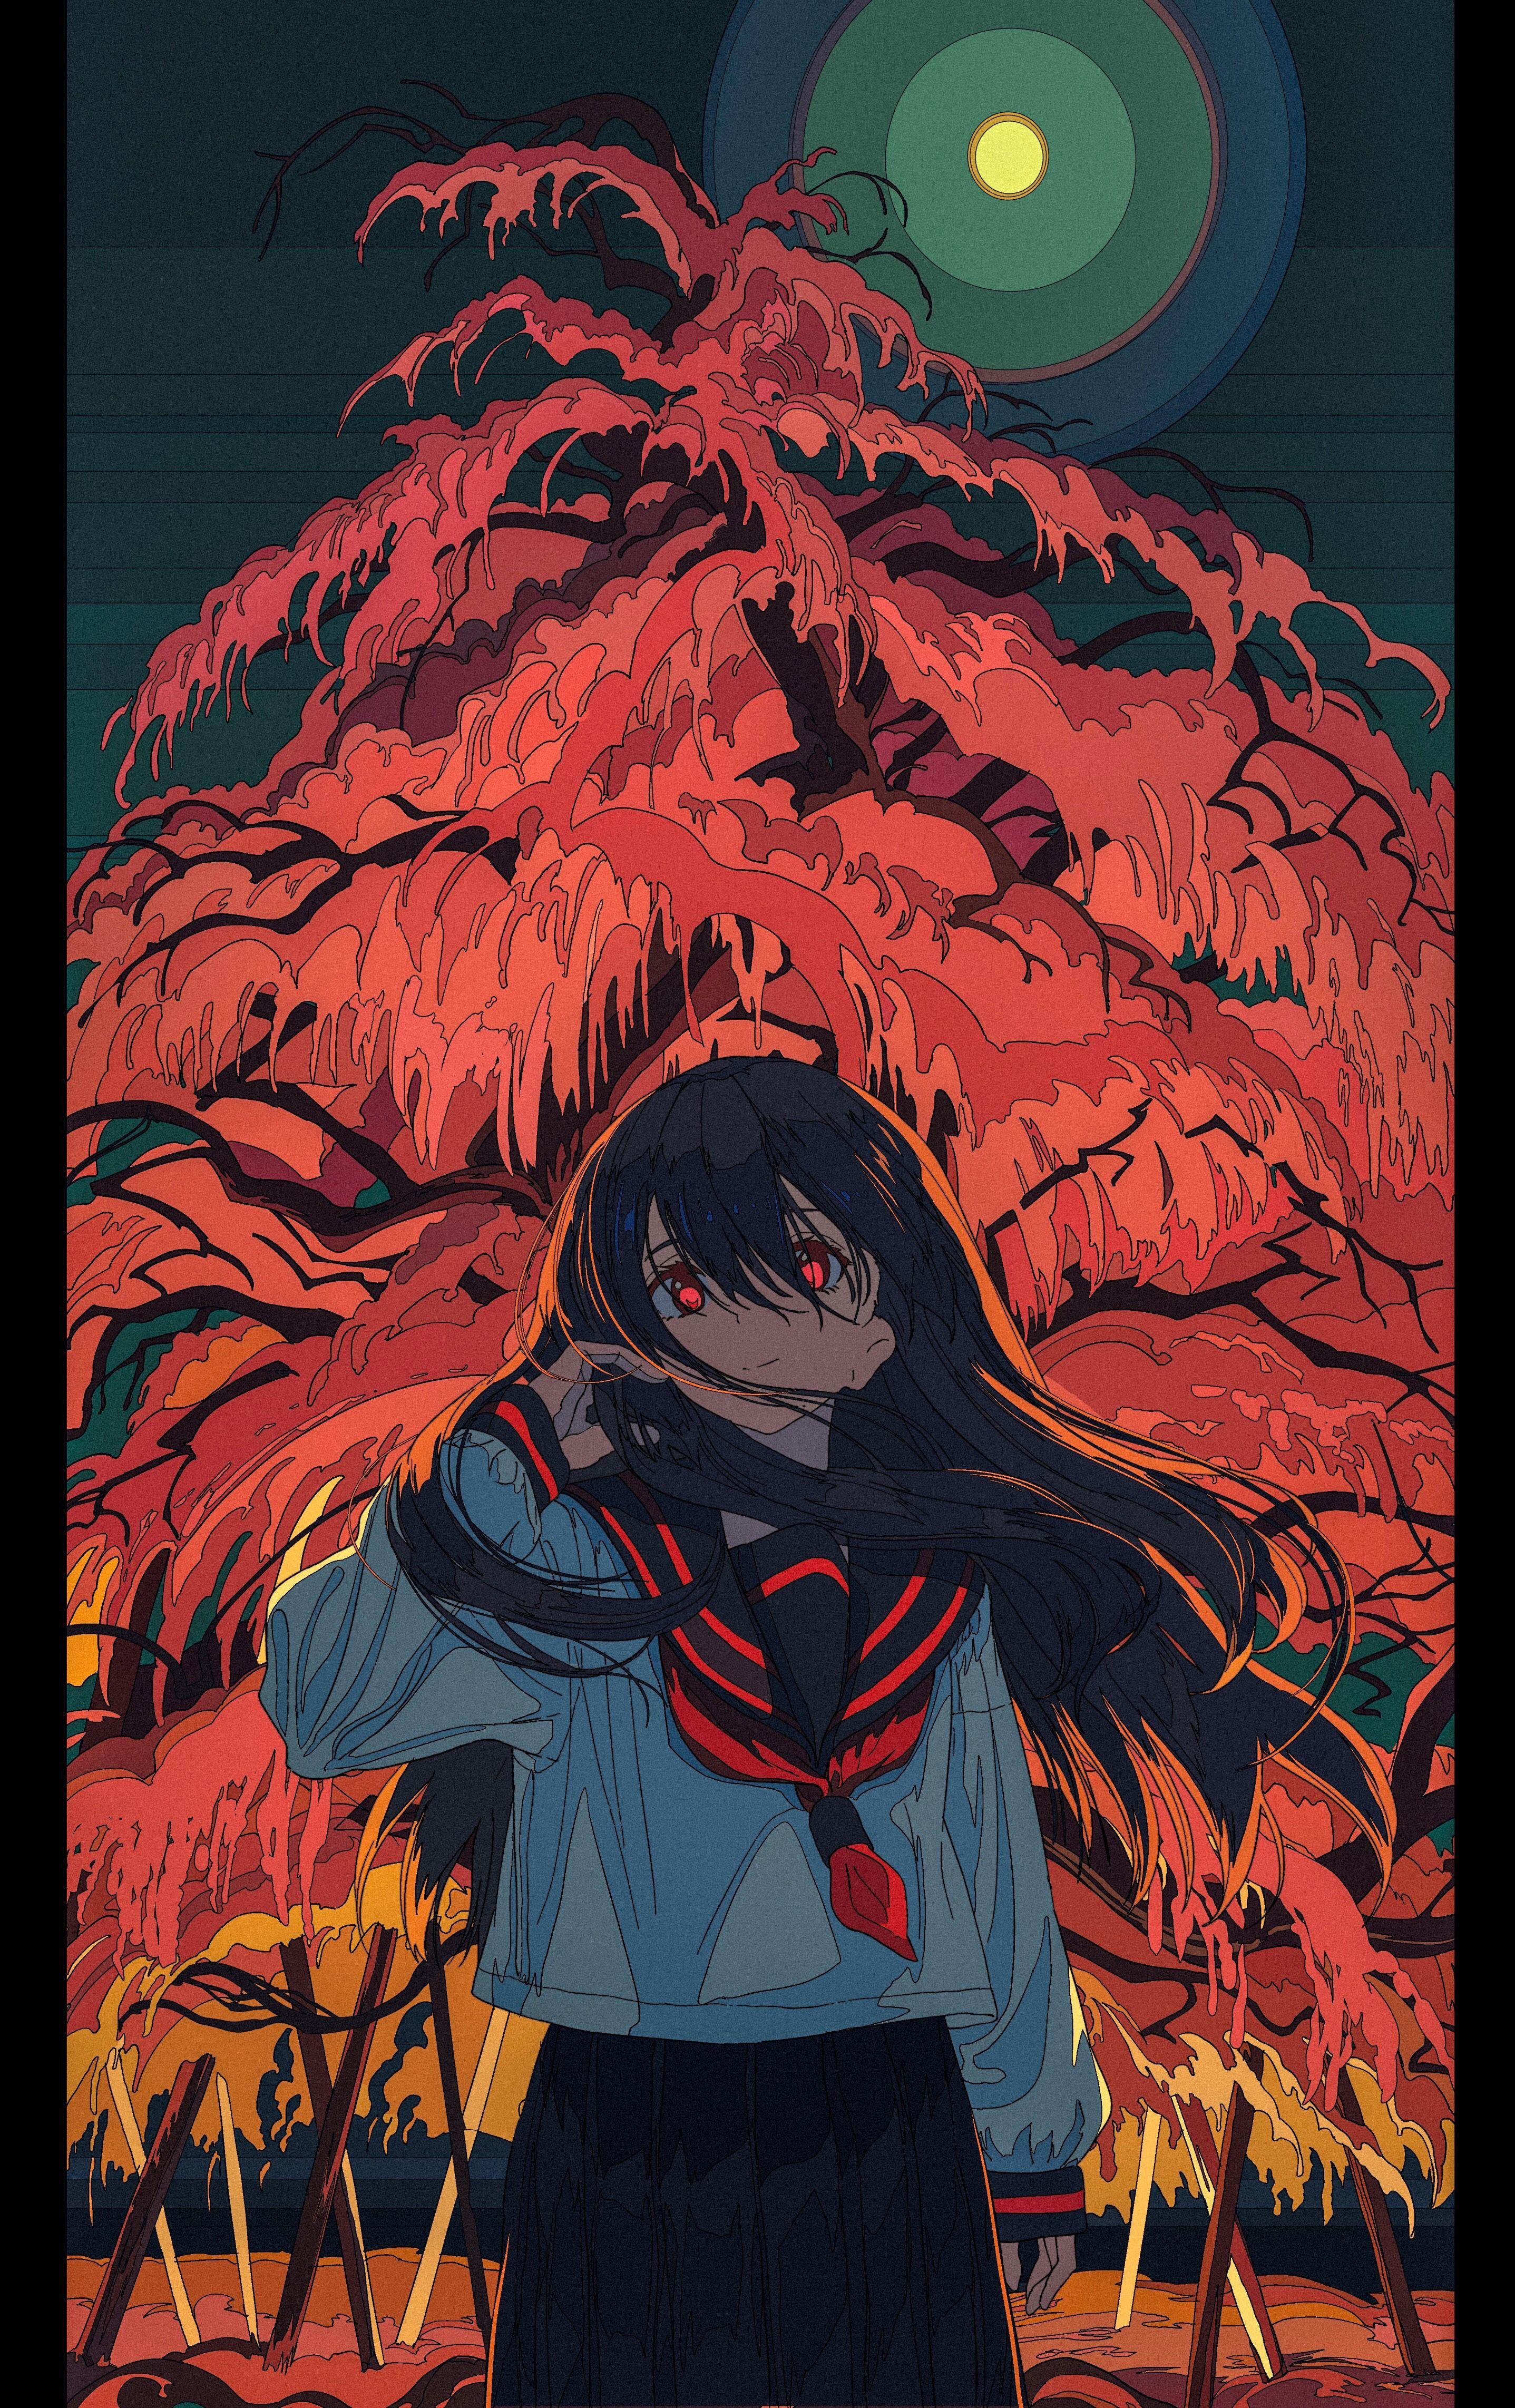 Pinterest (With images) Anime art, Manga art, Aesthetic